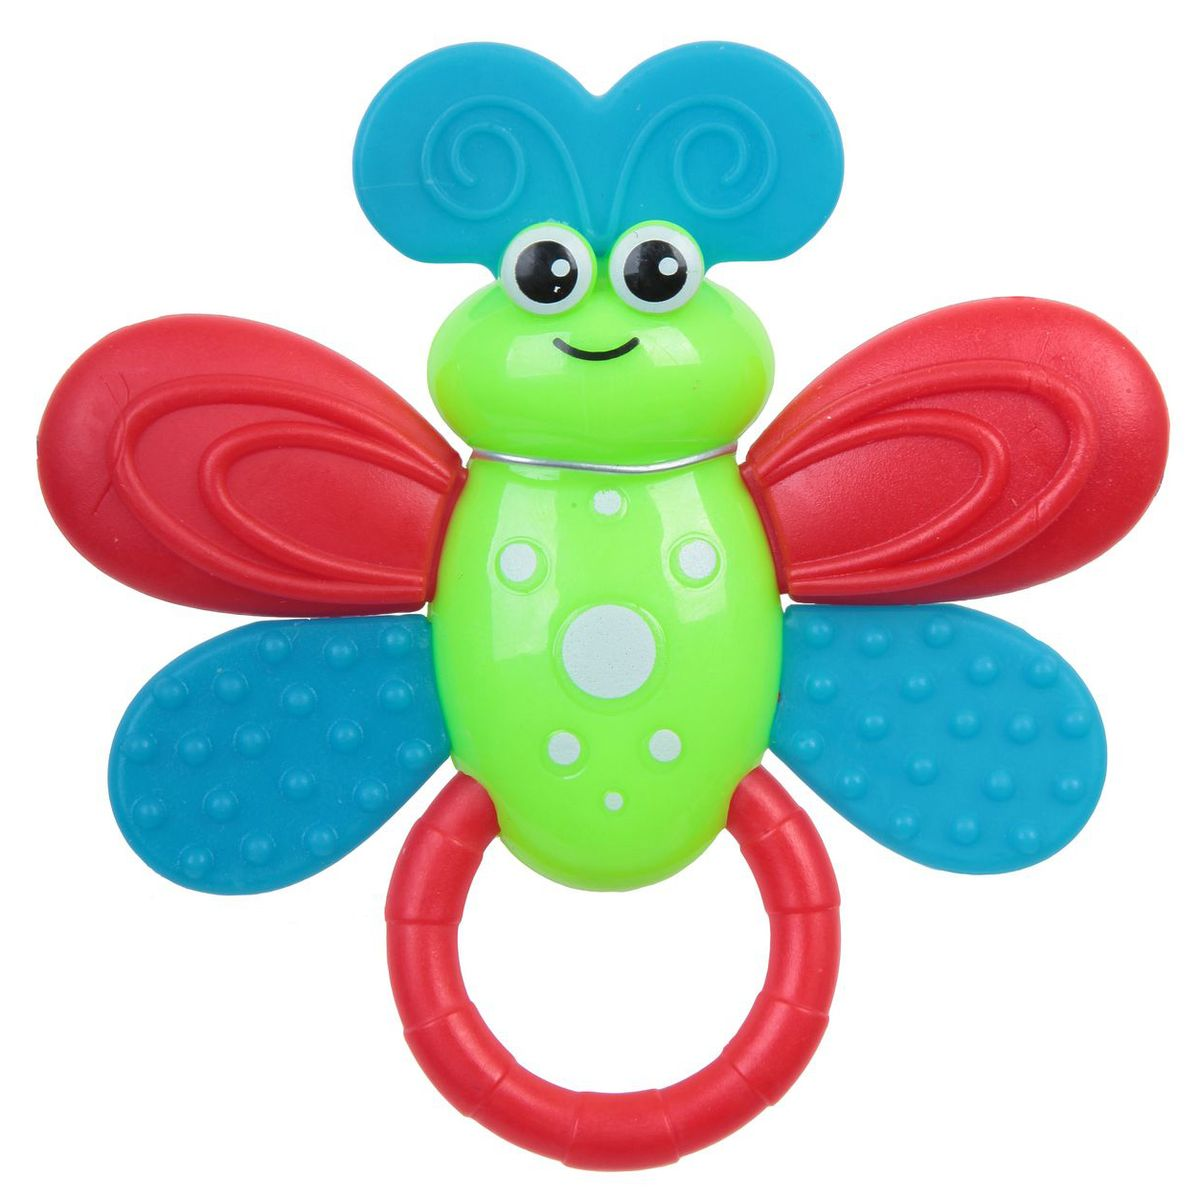 Bondibon Погремушка Пчелка цвет салатовый bondibon мягкая игрушка погремушка слоник